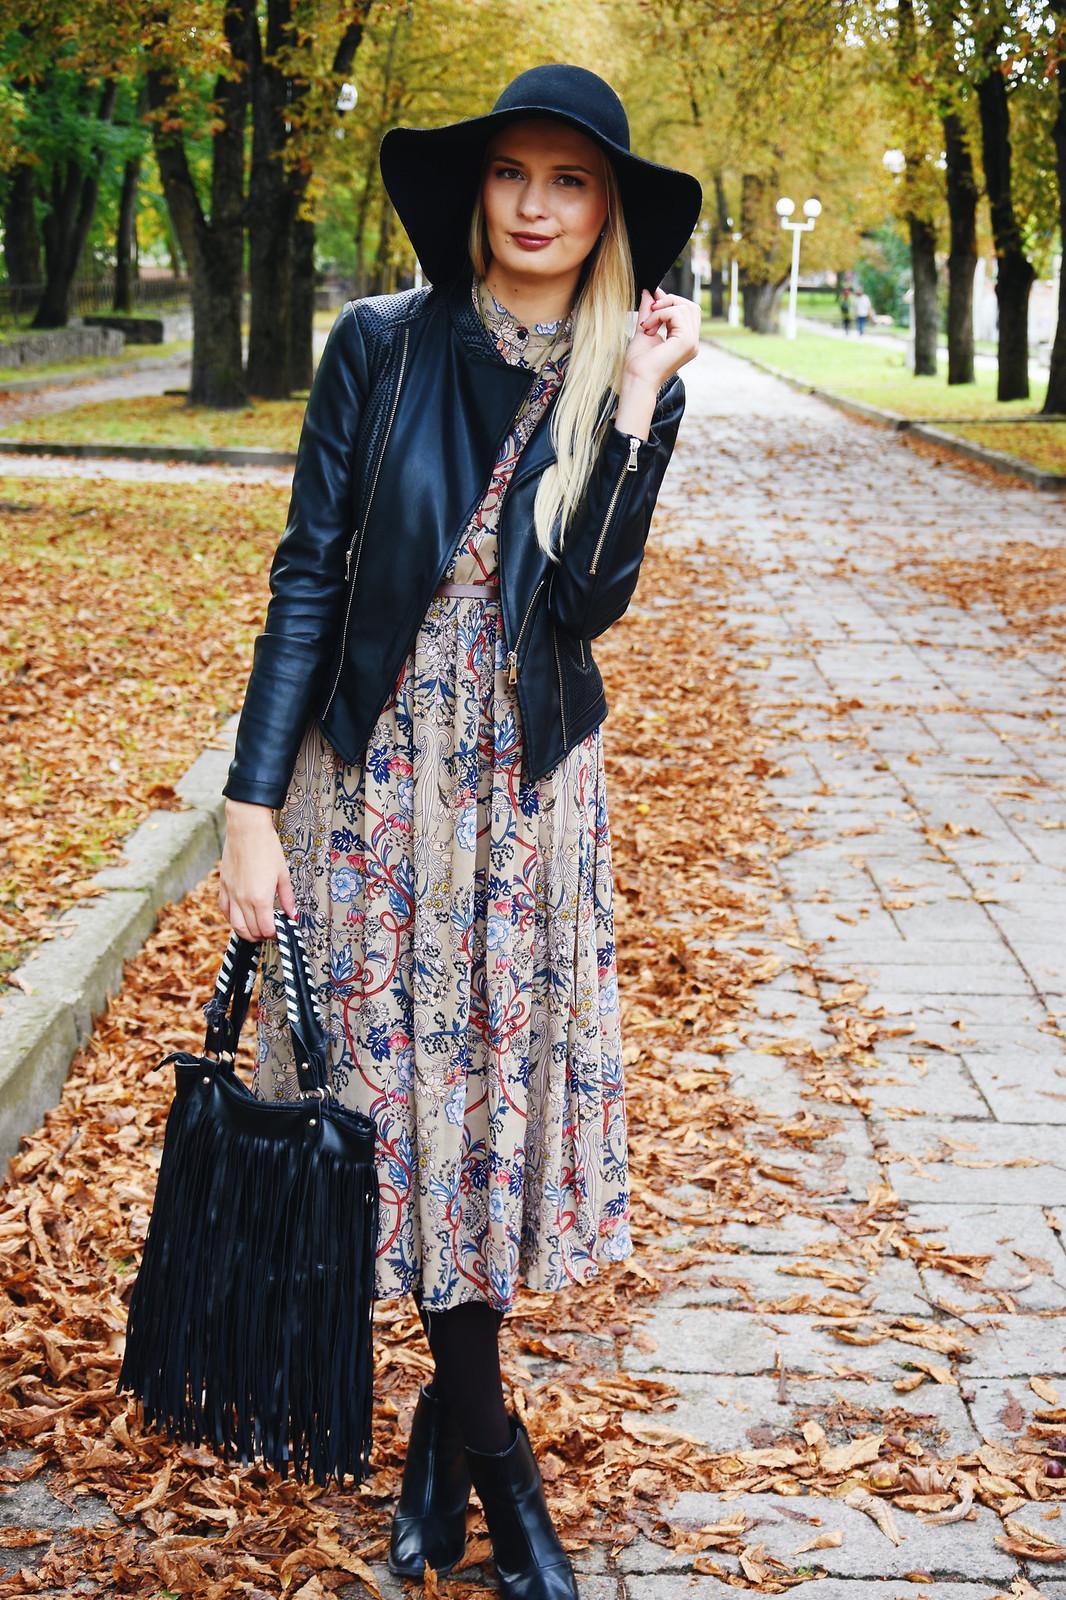 Brown midi dress from Zaful